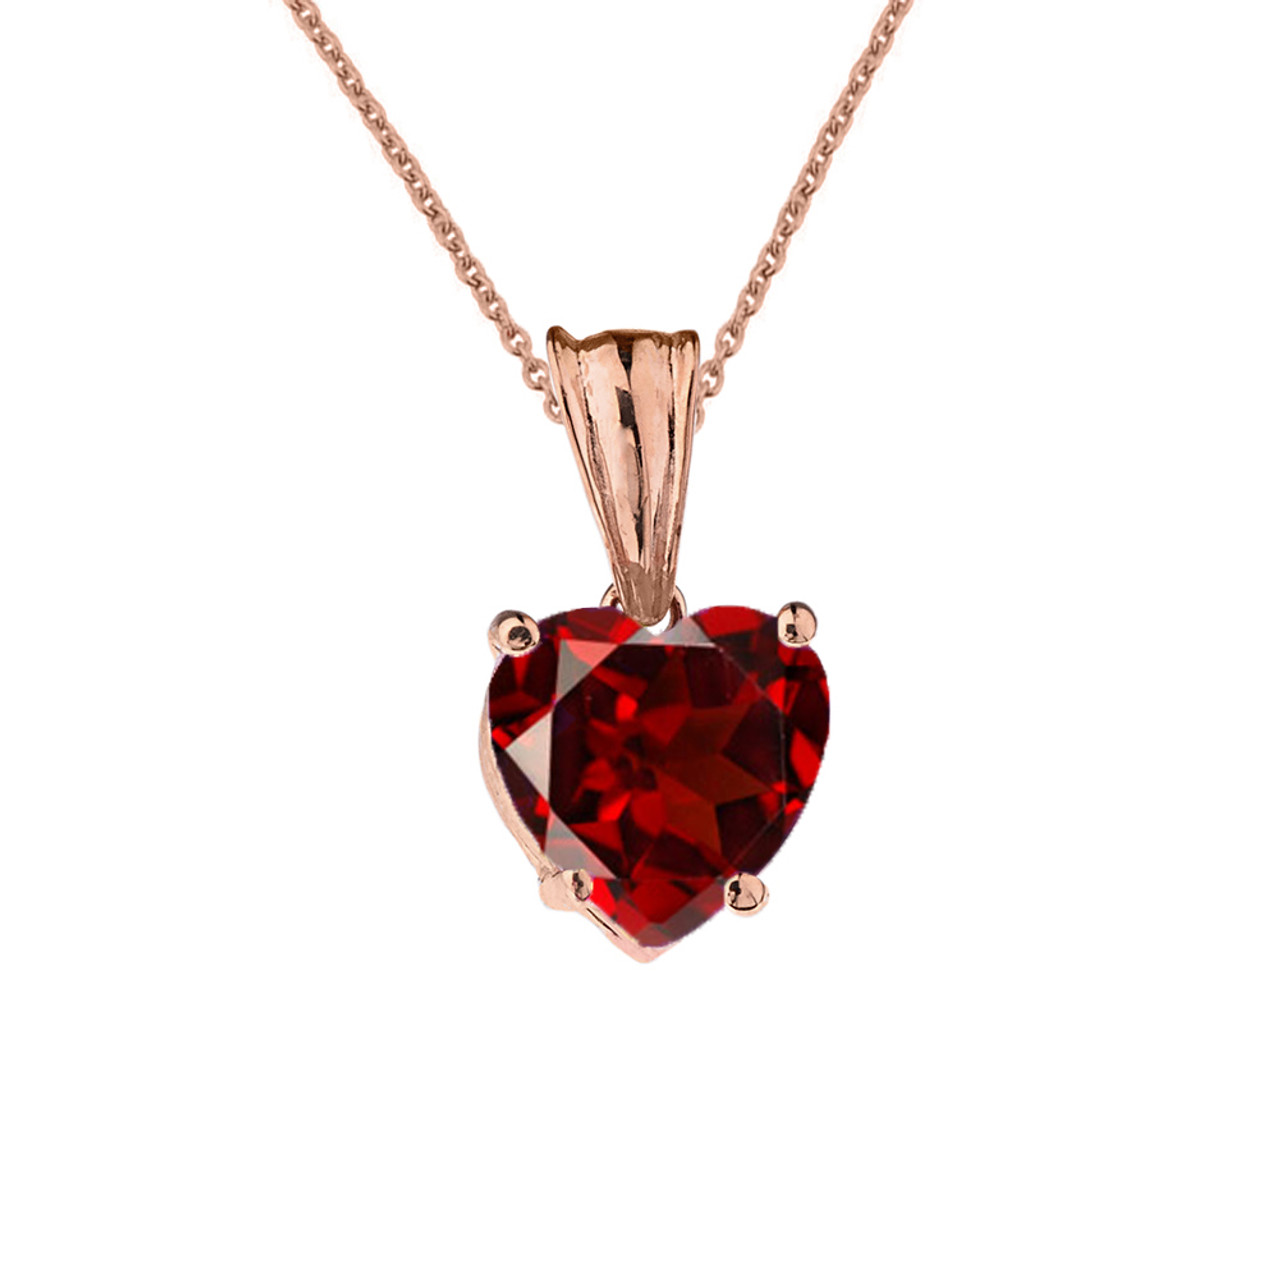 d479adbeab838 10K Rose Gold Heart January Birthstone Garnet (LCG) Pendant Necklace